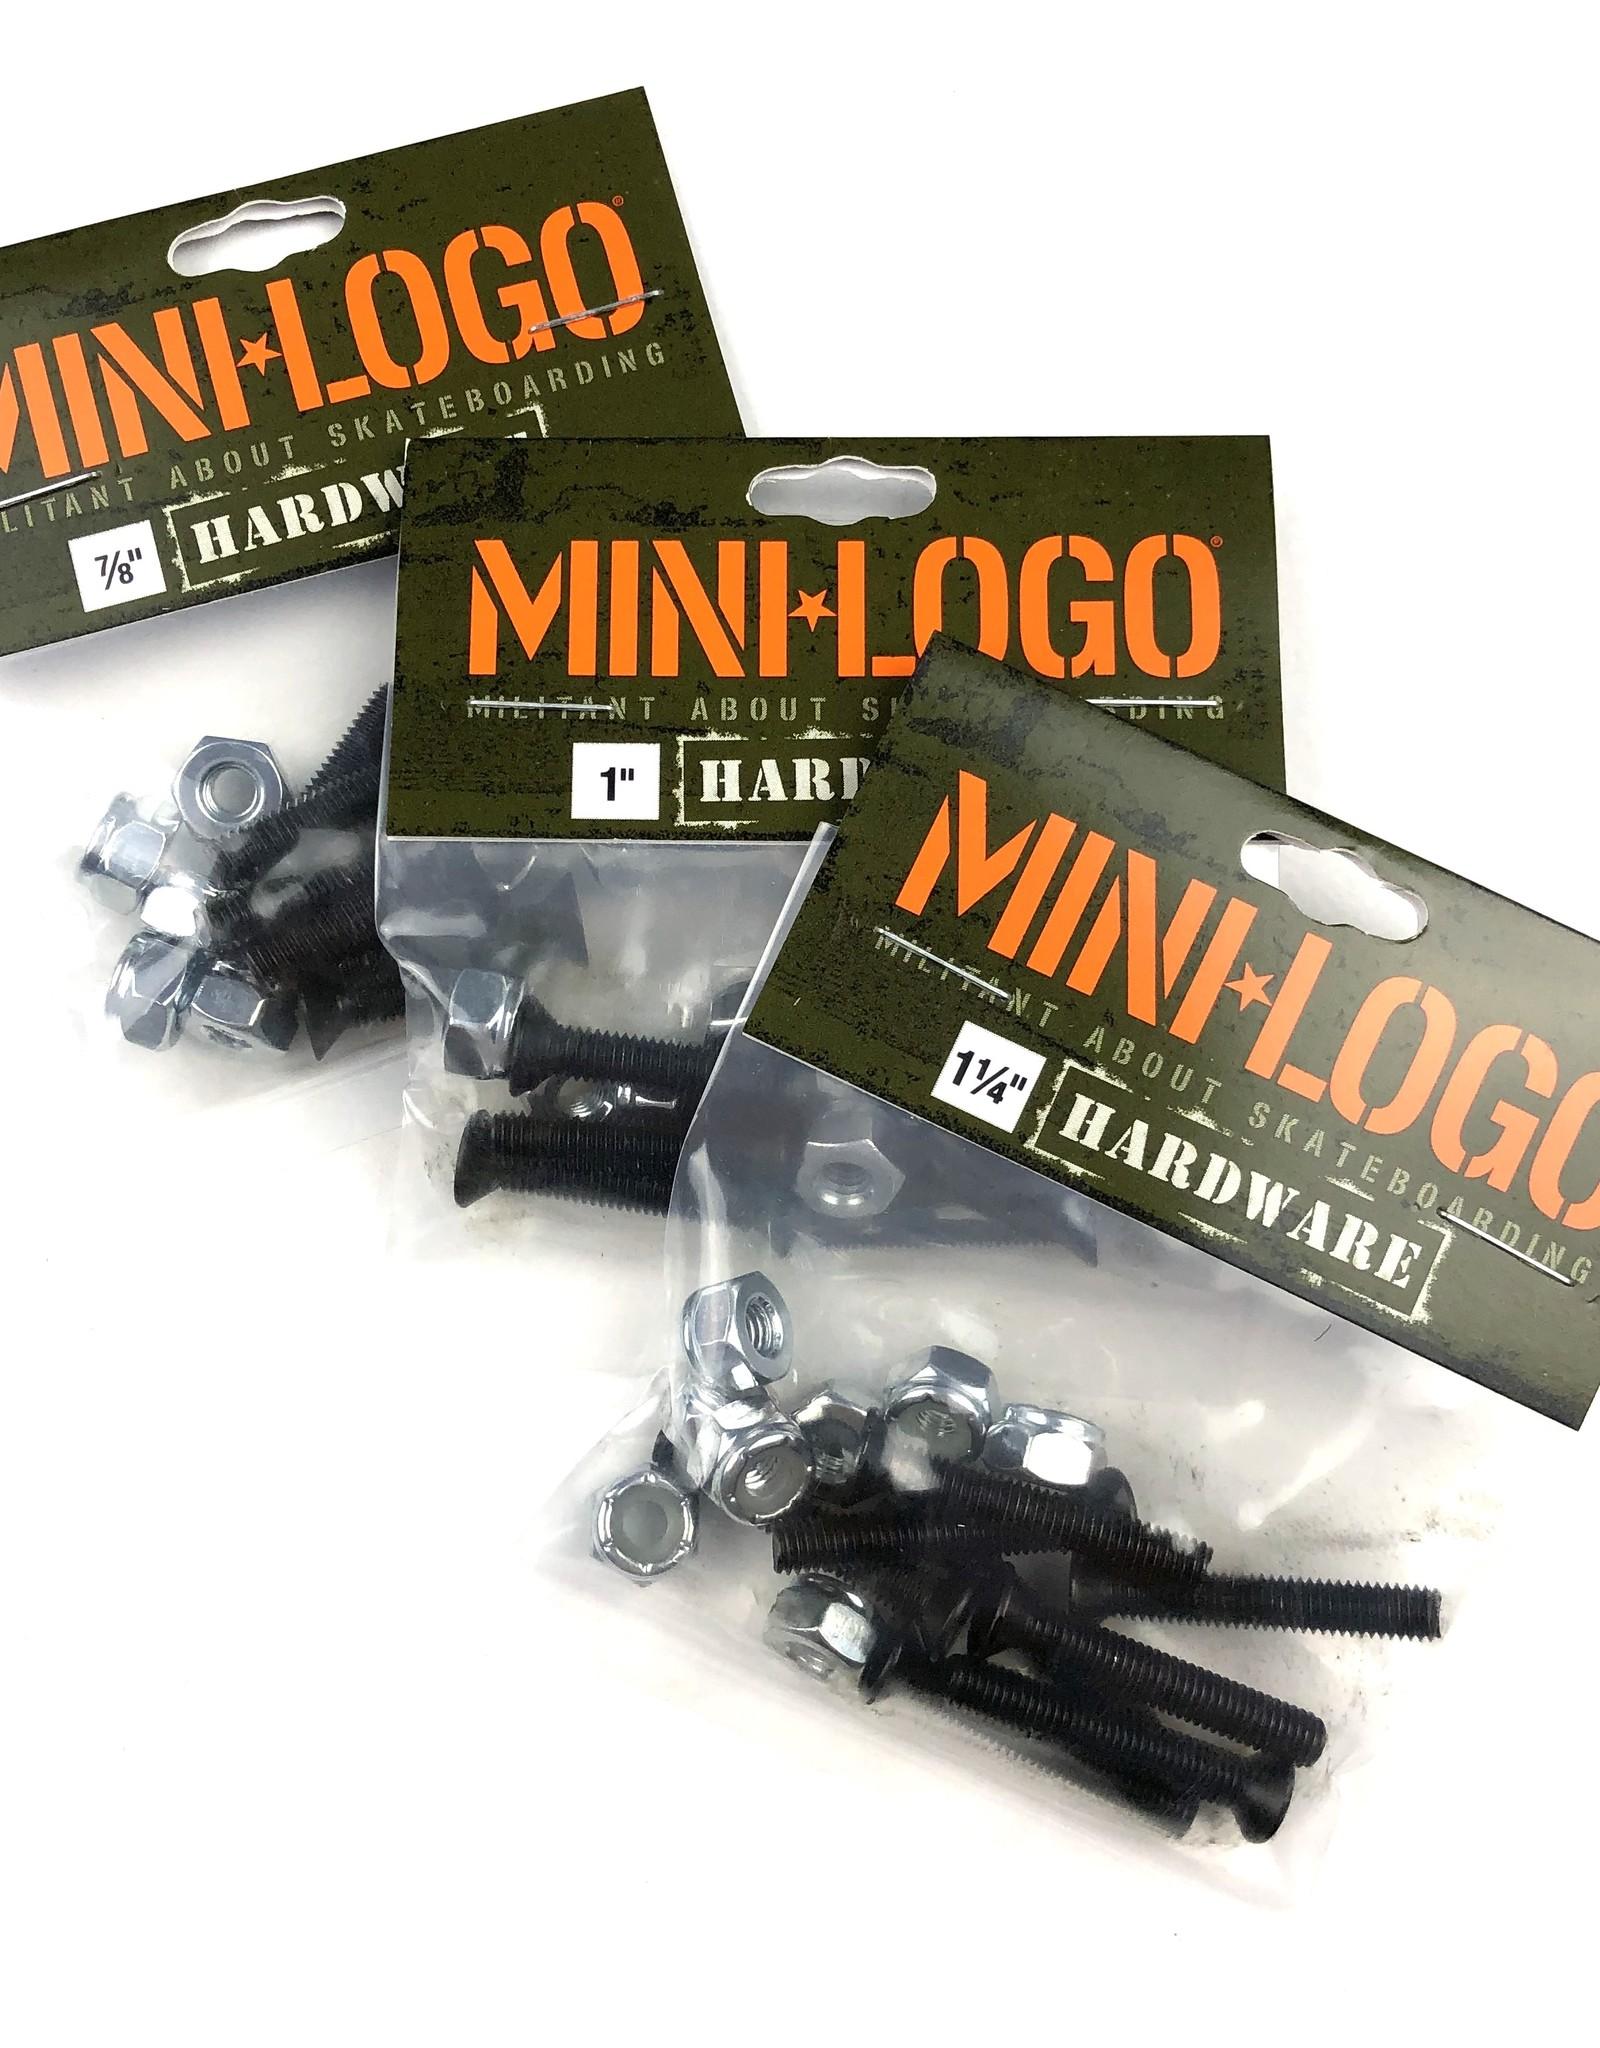 "MINI LOGO Militant Skateboard Hardware 1 1//4"" Screws Nuts Phillips"